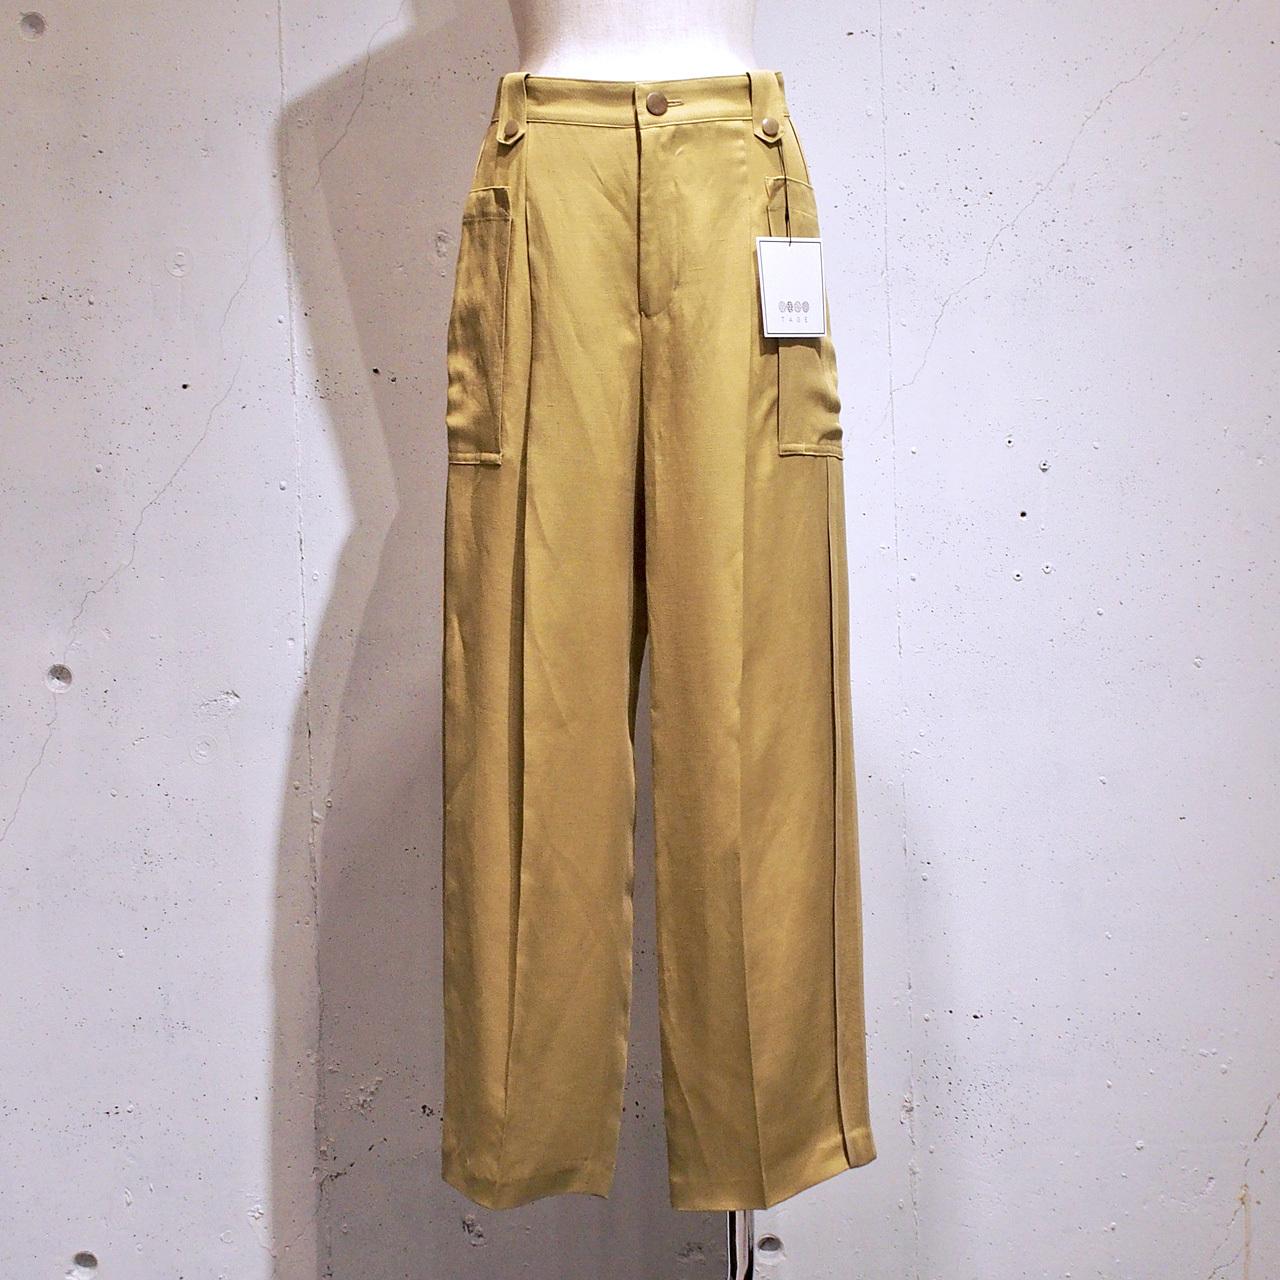 TAGE / サイドパイピングセミワイドトラウザーズ / Yellow